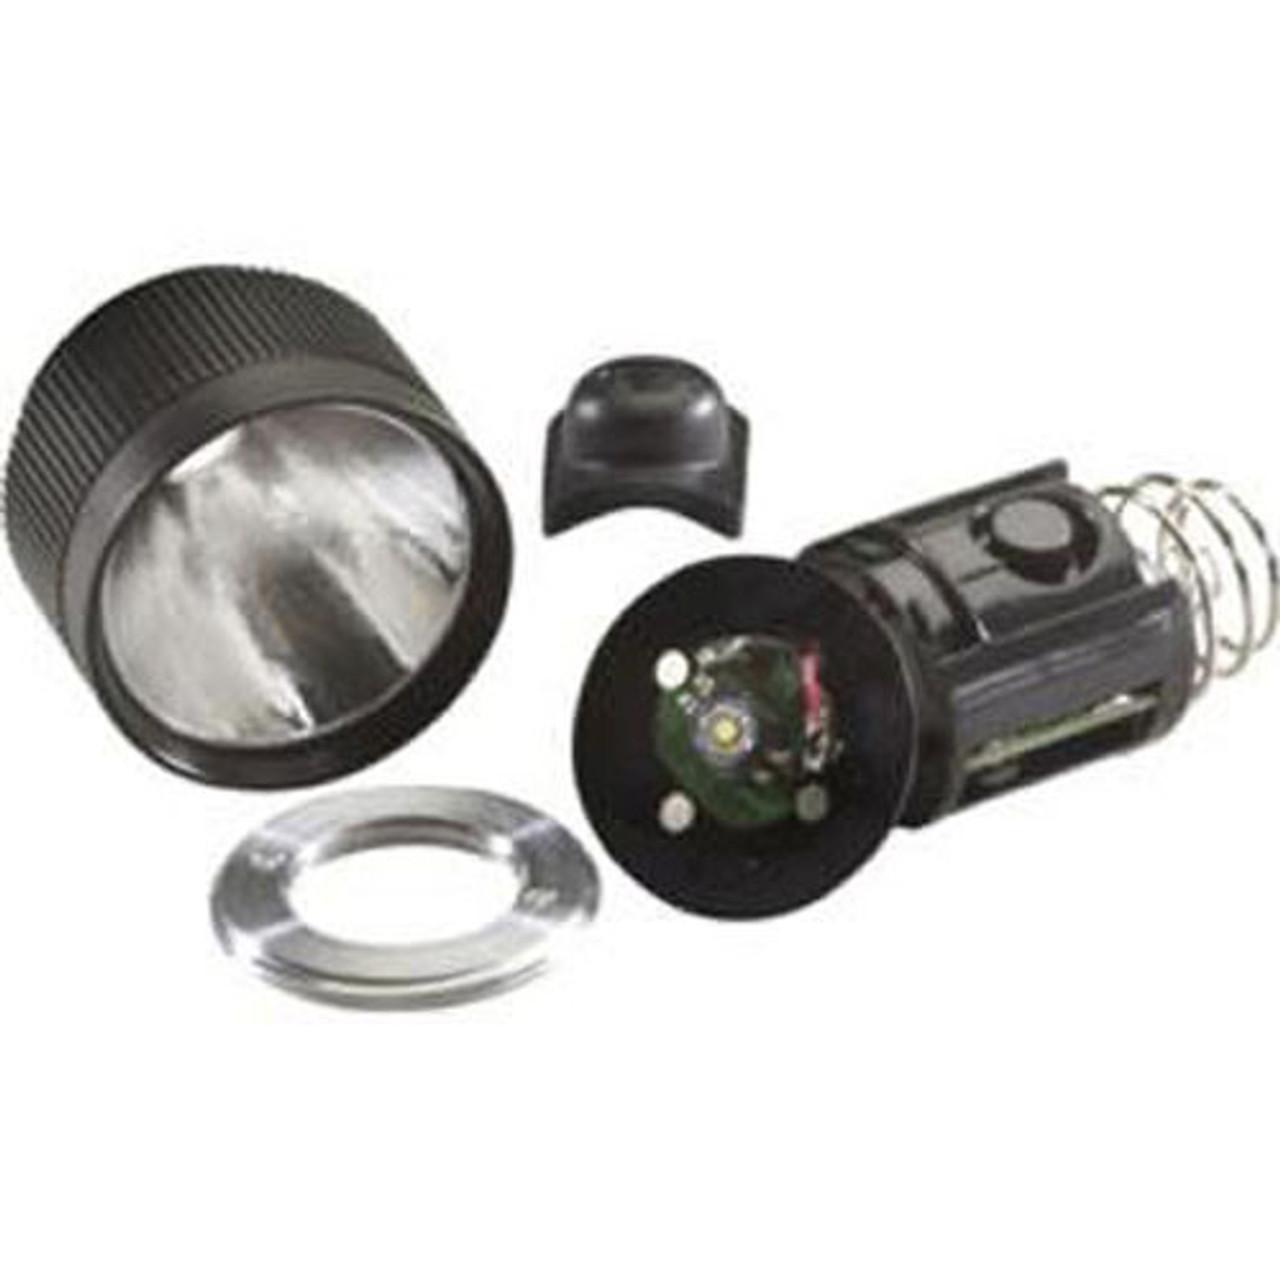 Streamlight 75690 Stinger C4 LED Mud Brown Flashlight LIGHT ONLY